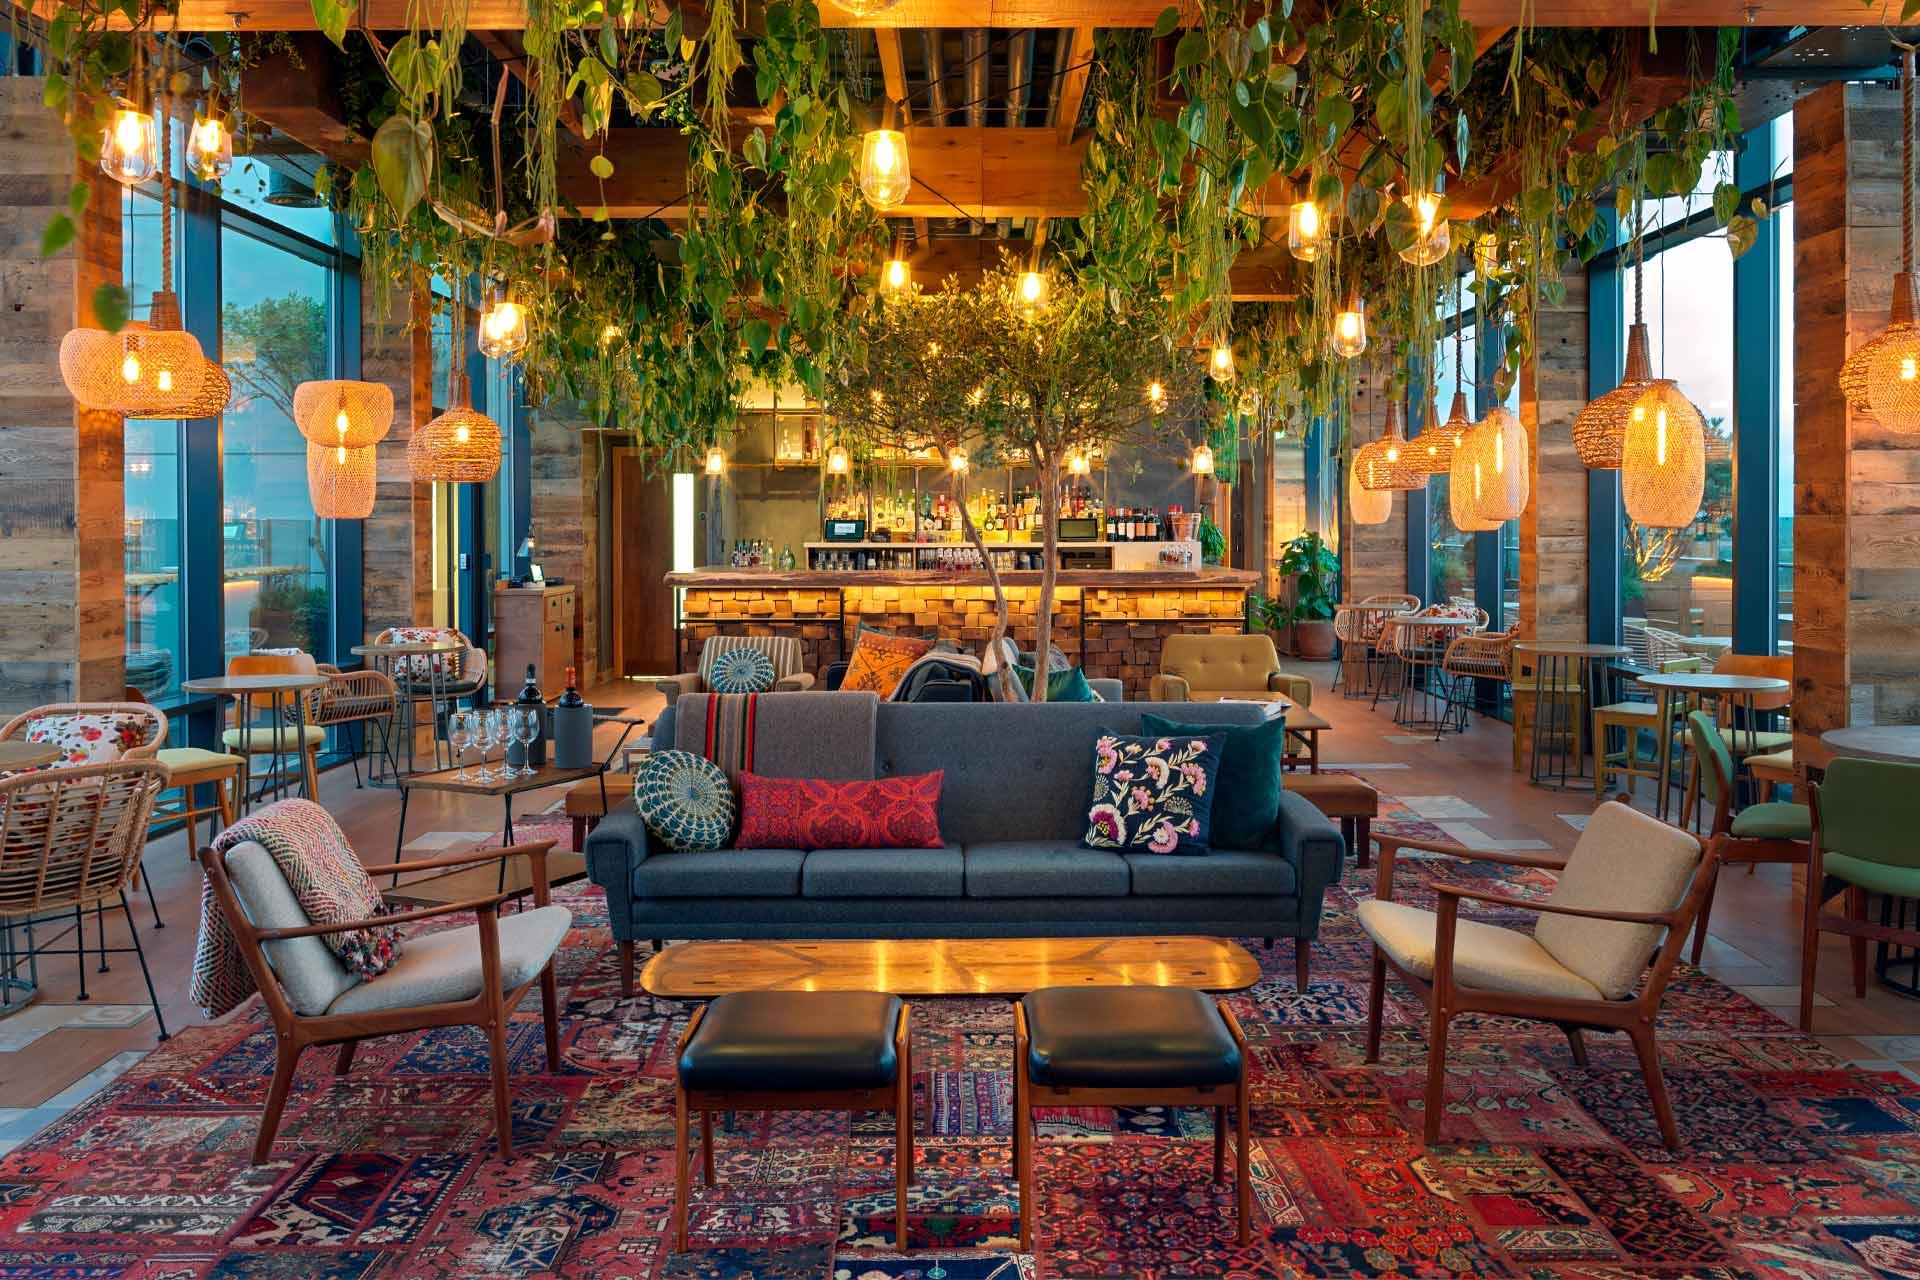 Treehouse Hotel in London